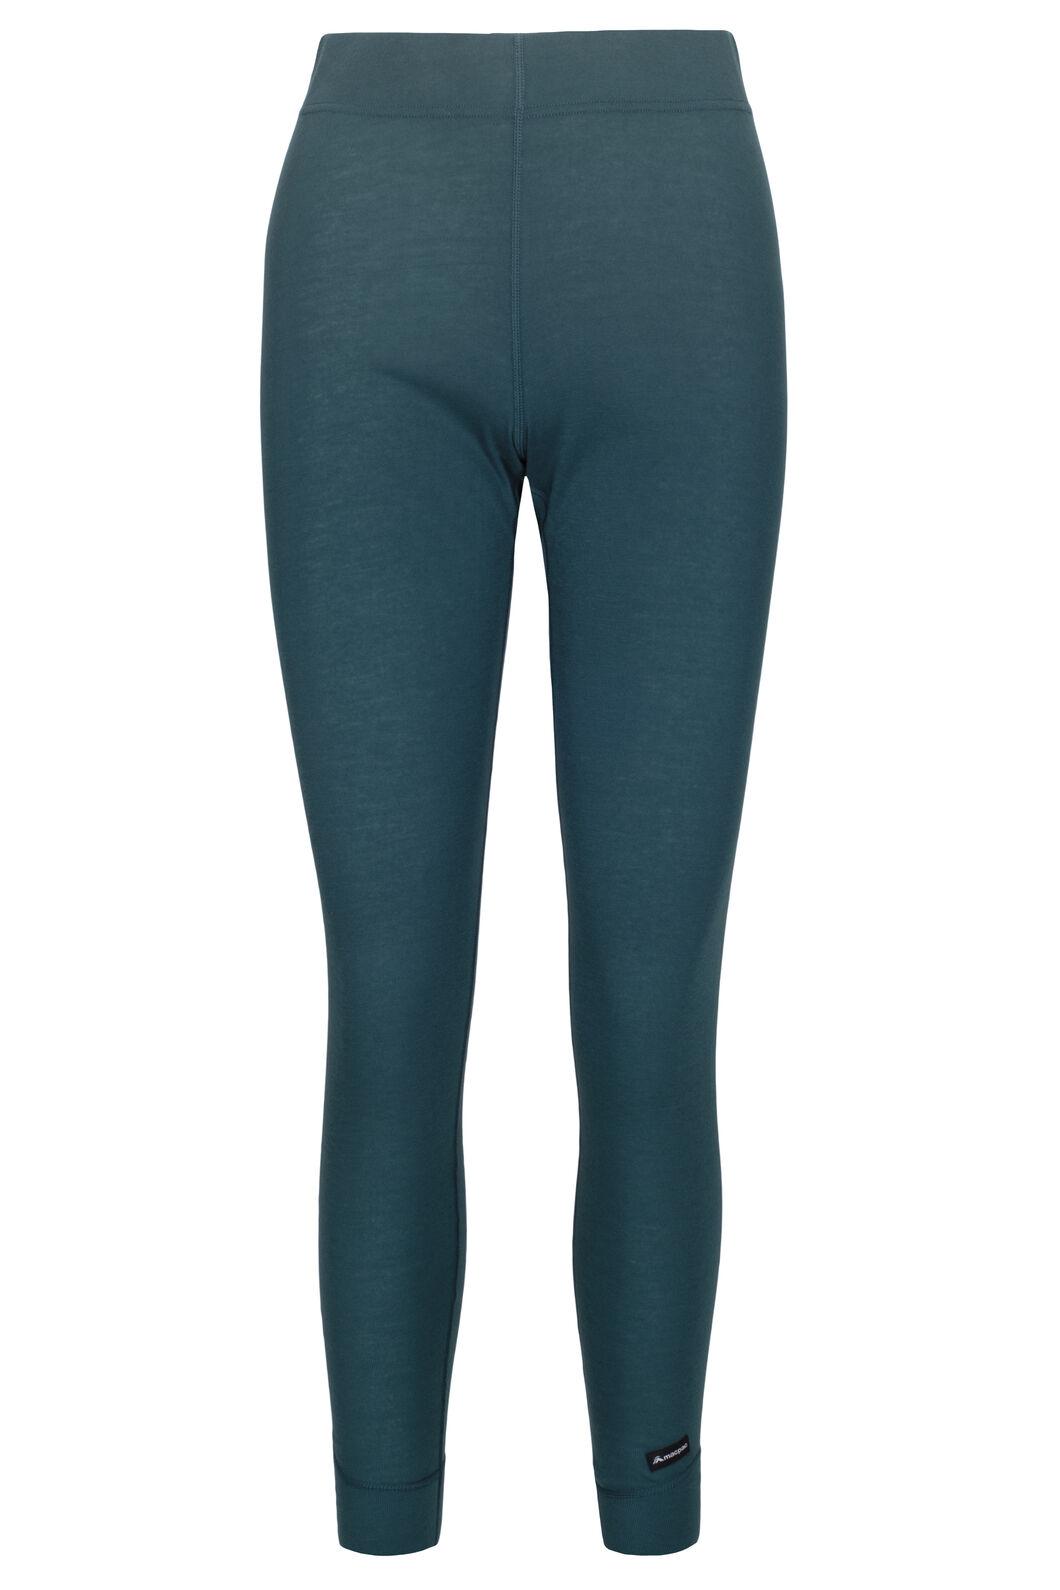 Macpac Geothermal Pants — Women's, Reflecting Pond, hi-res